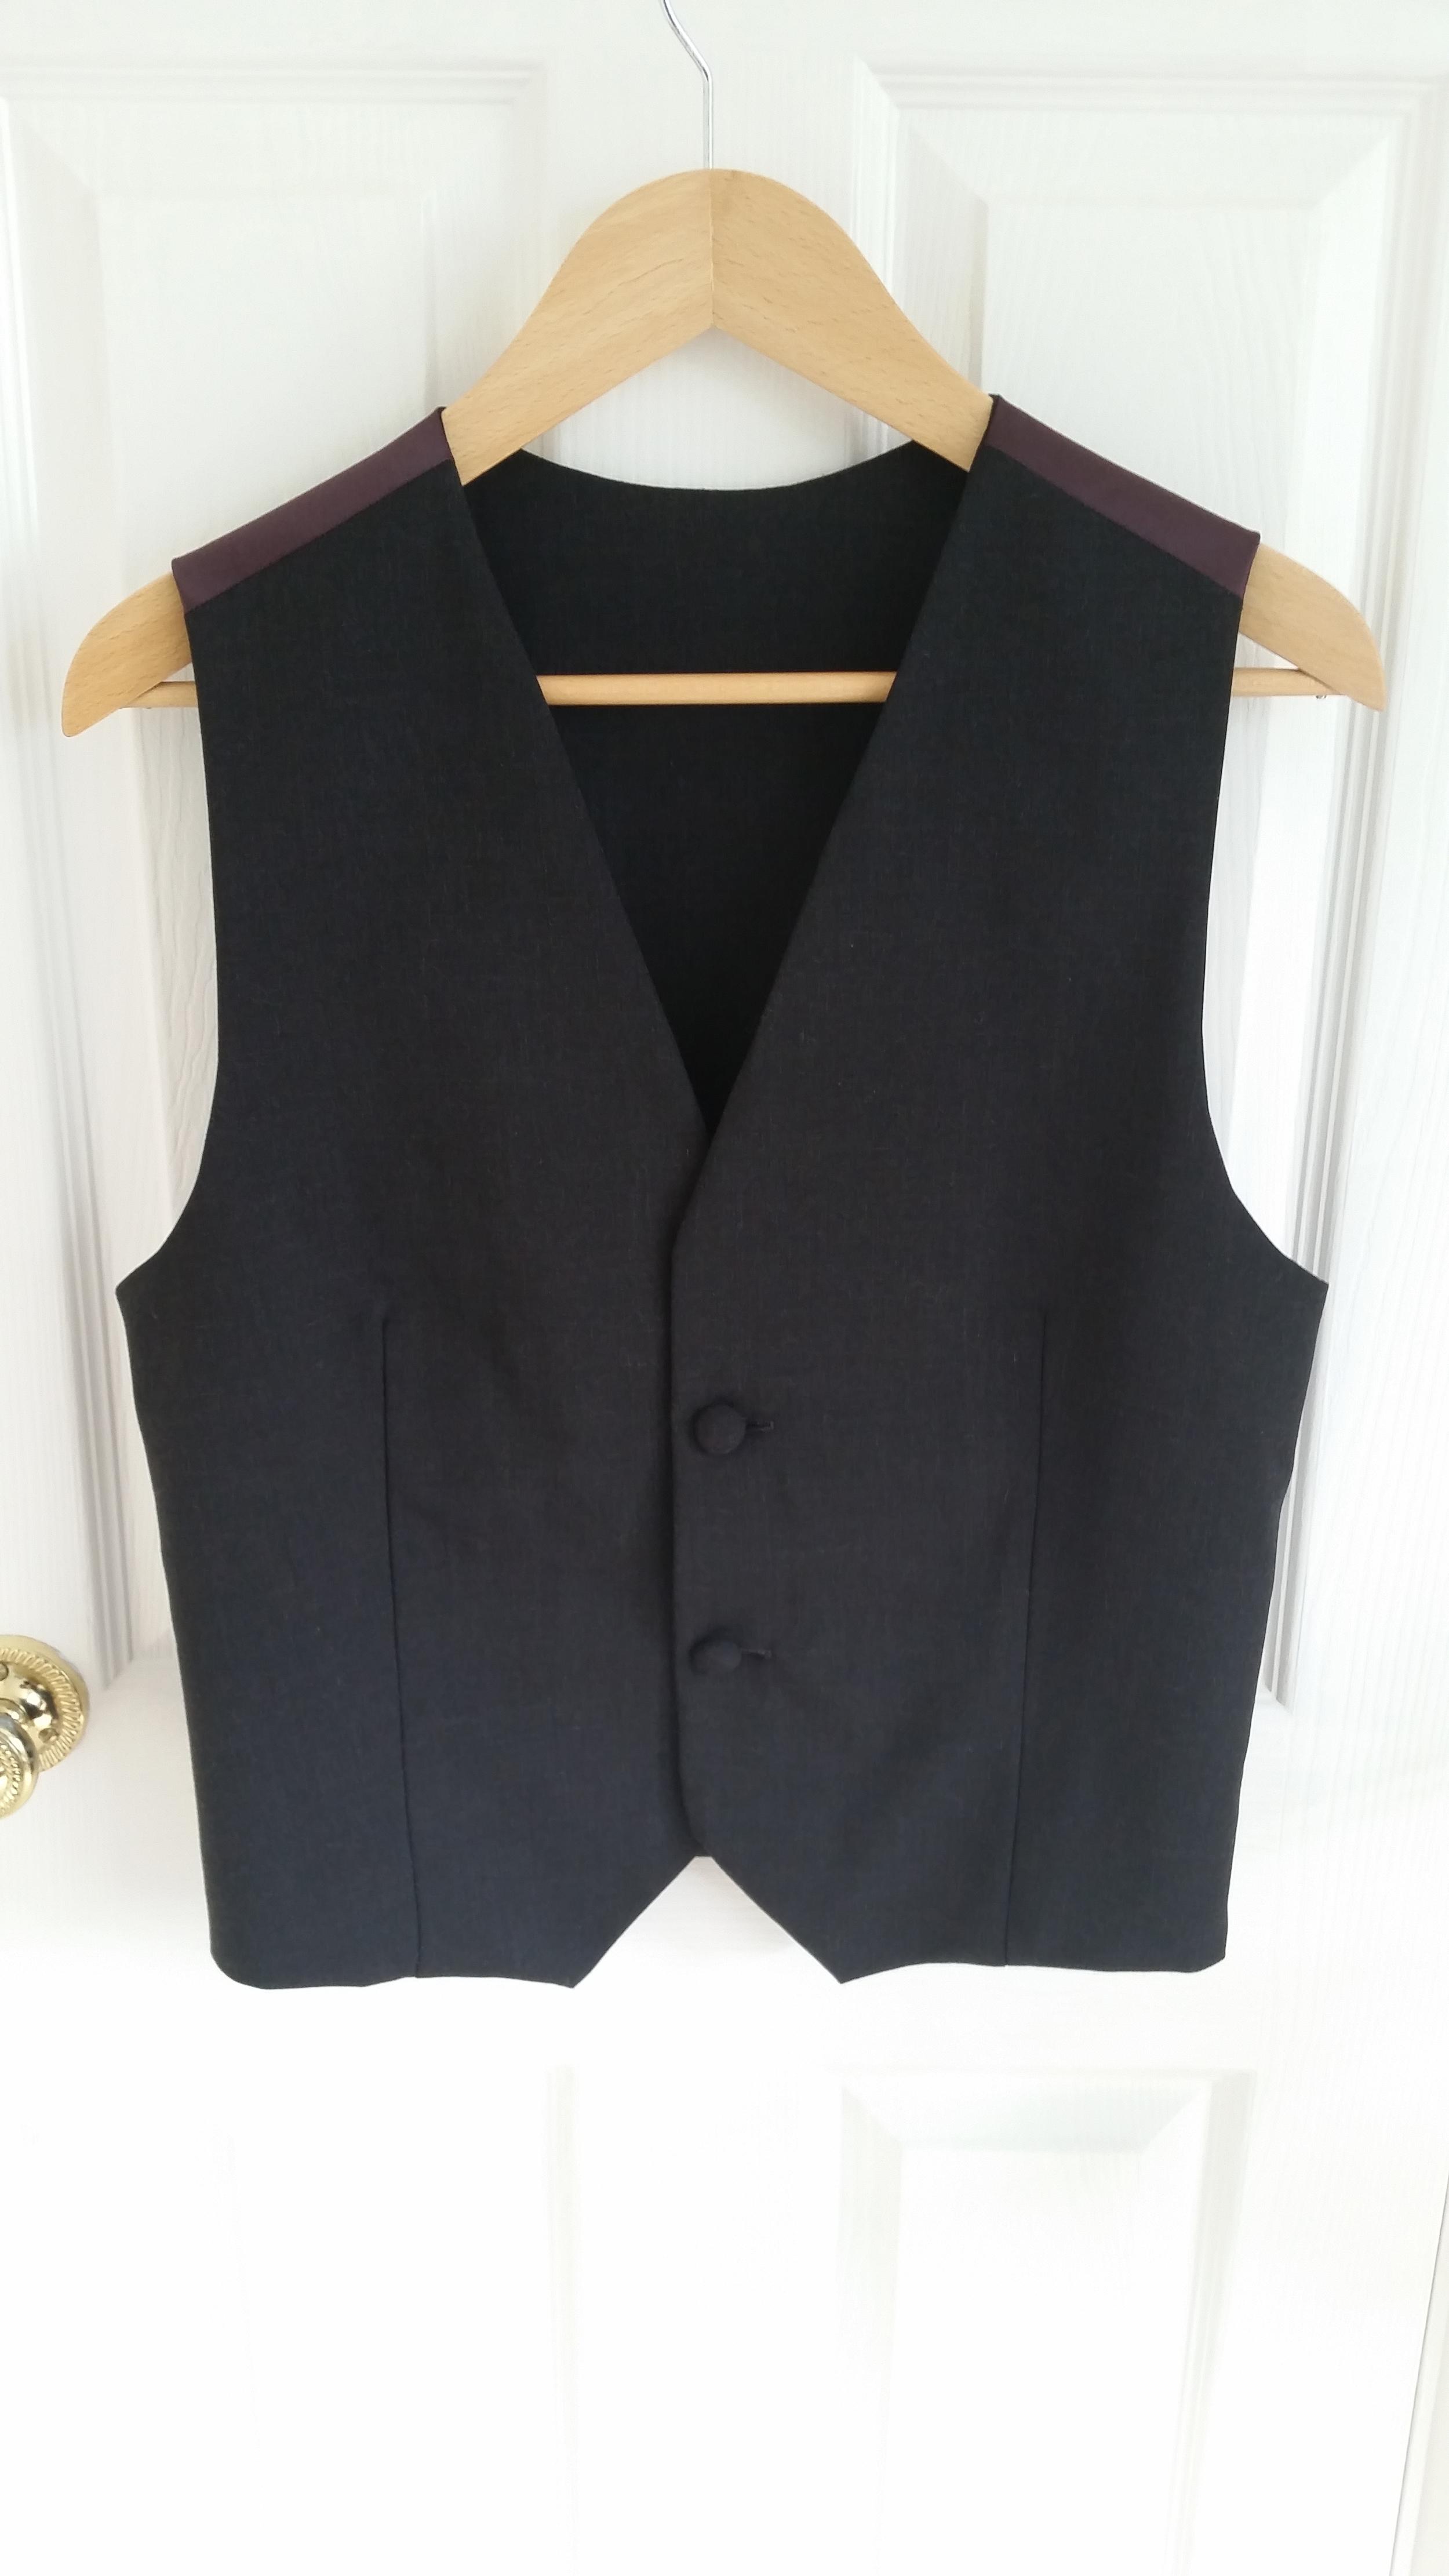 waistcoat5.jpg